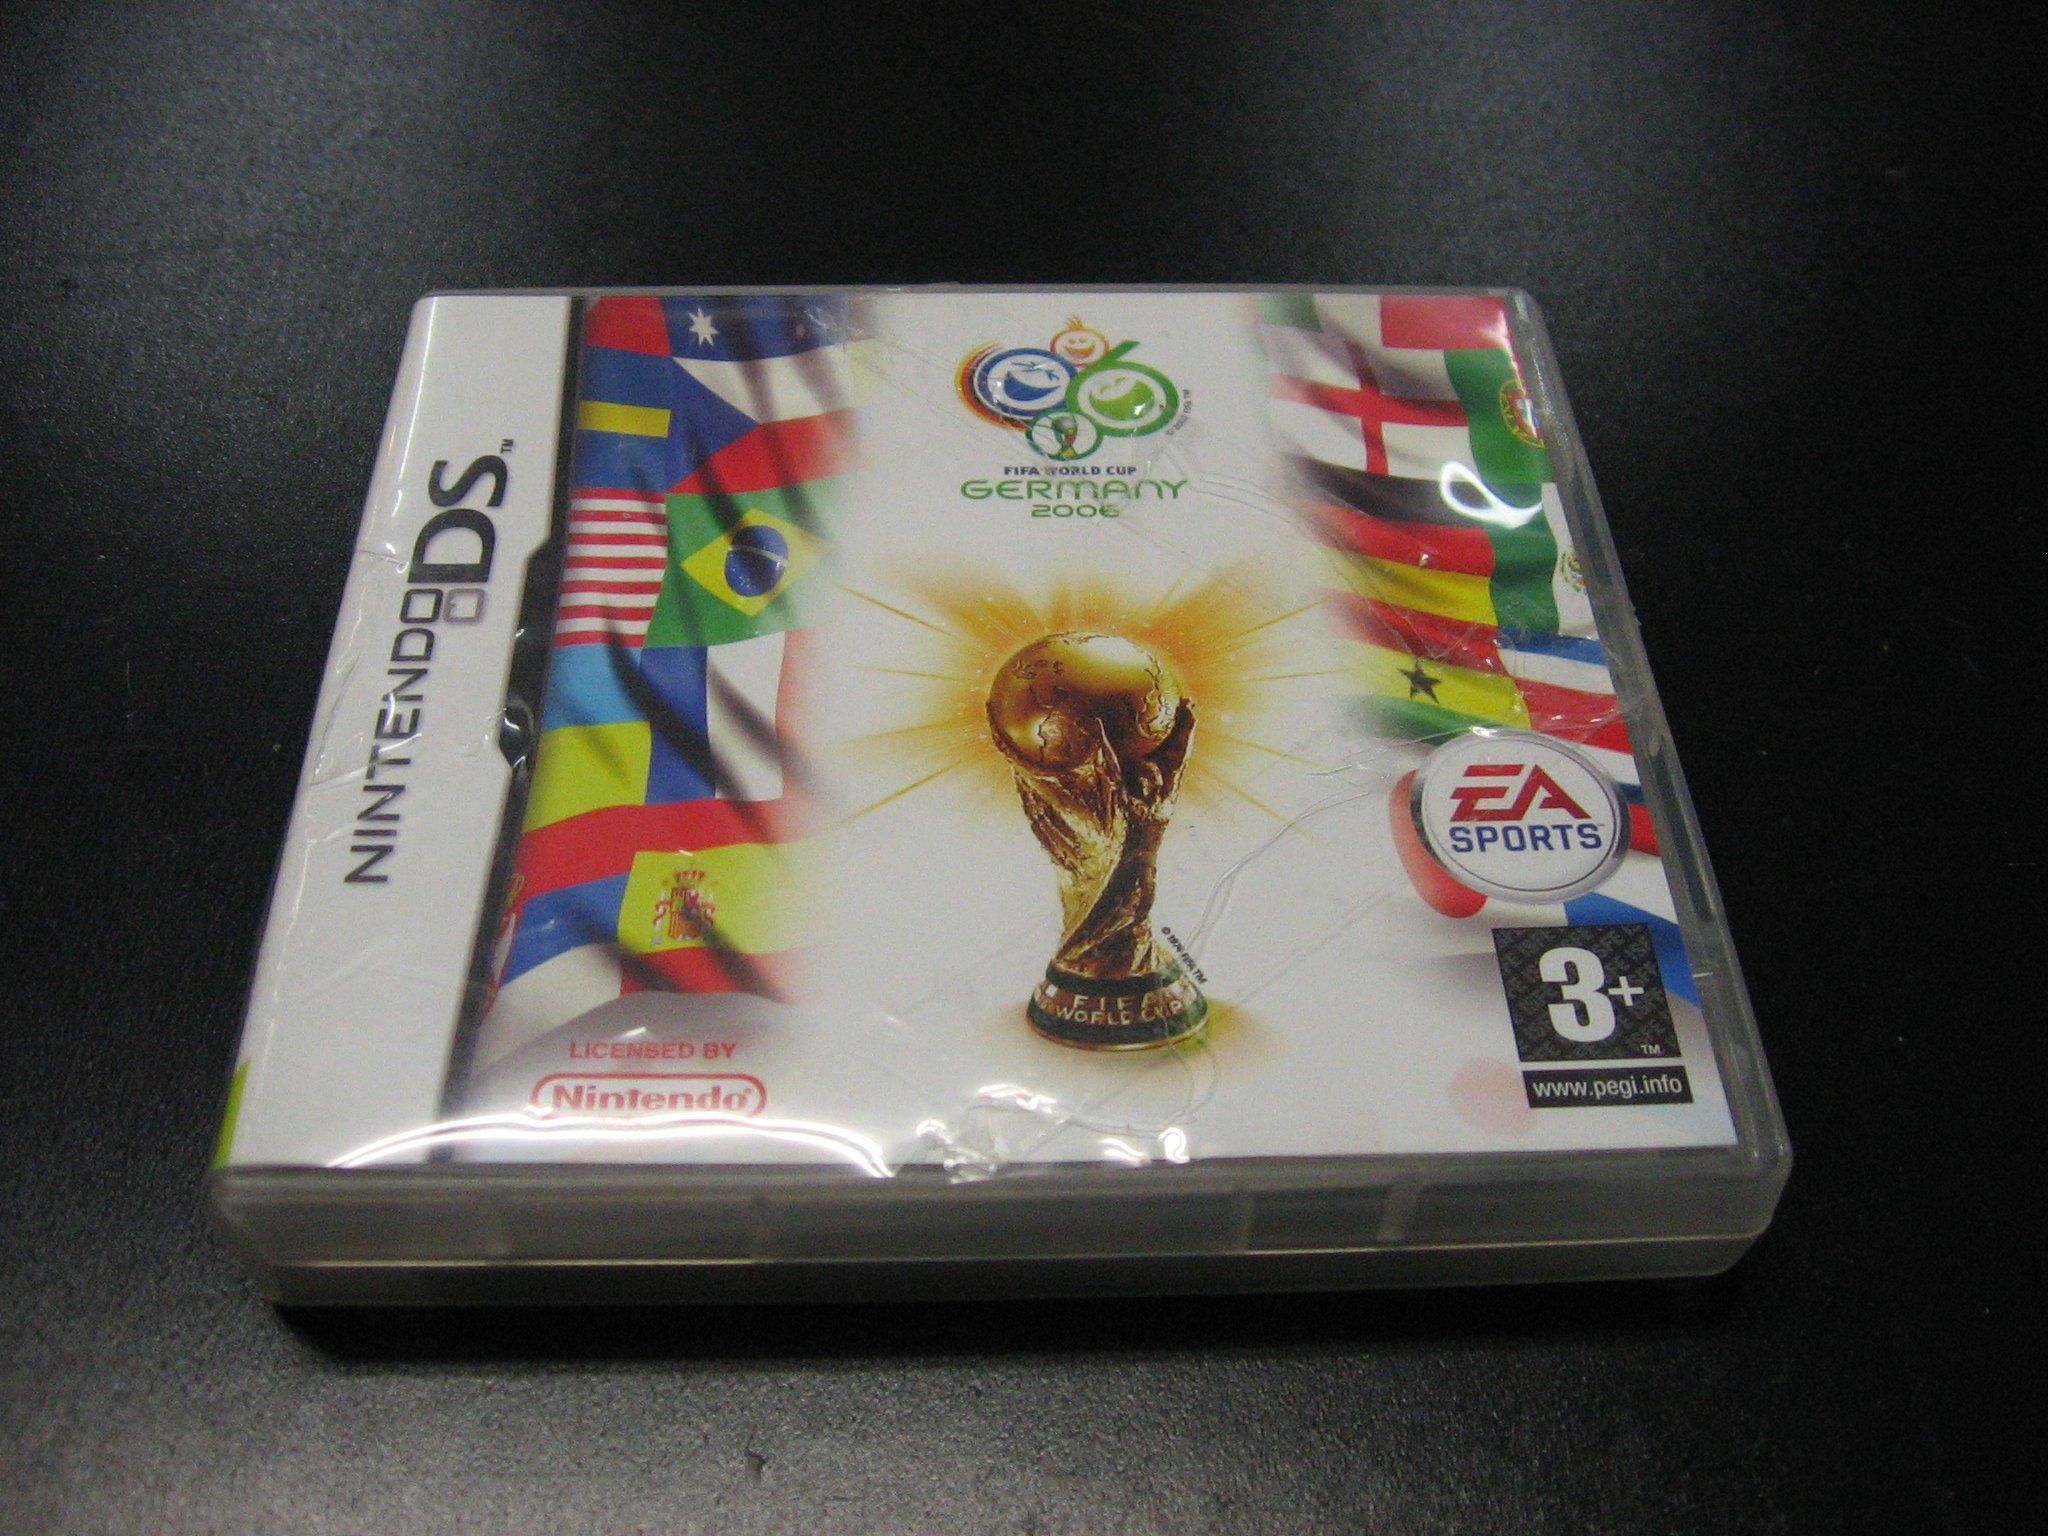 2006 FIFA WORLD CUP NINTENDO DS - Opole